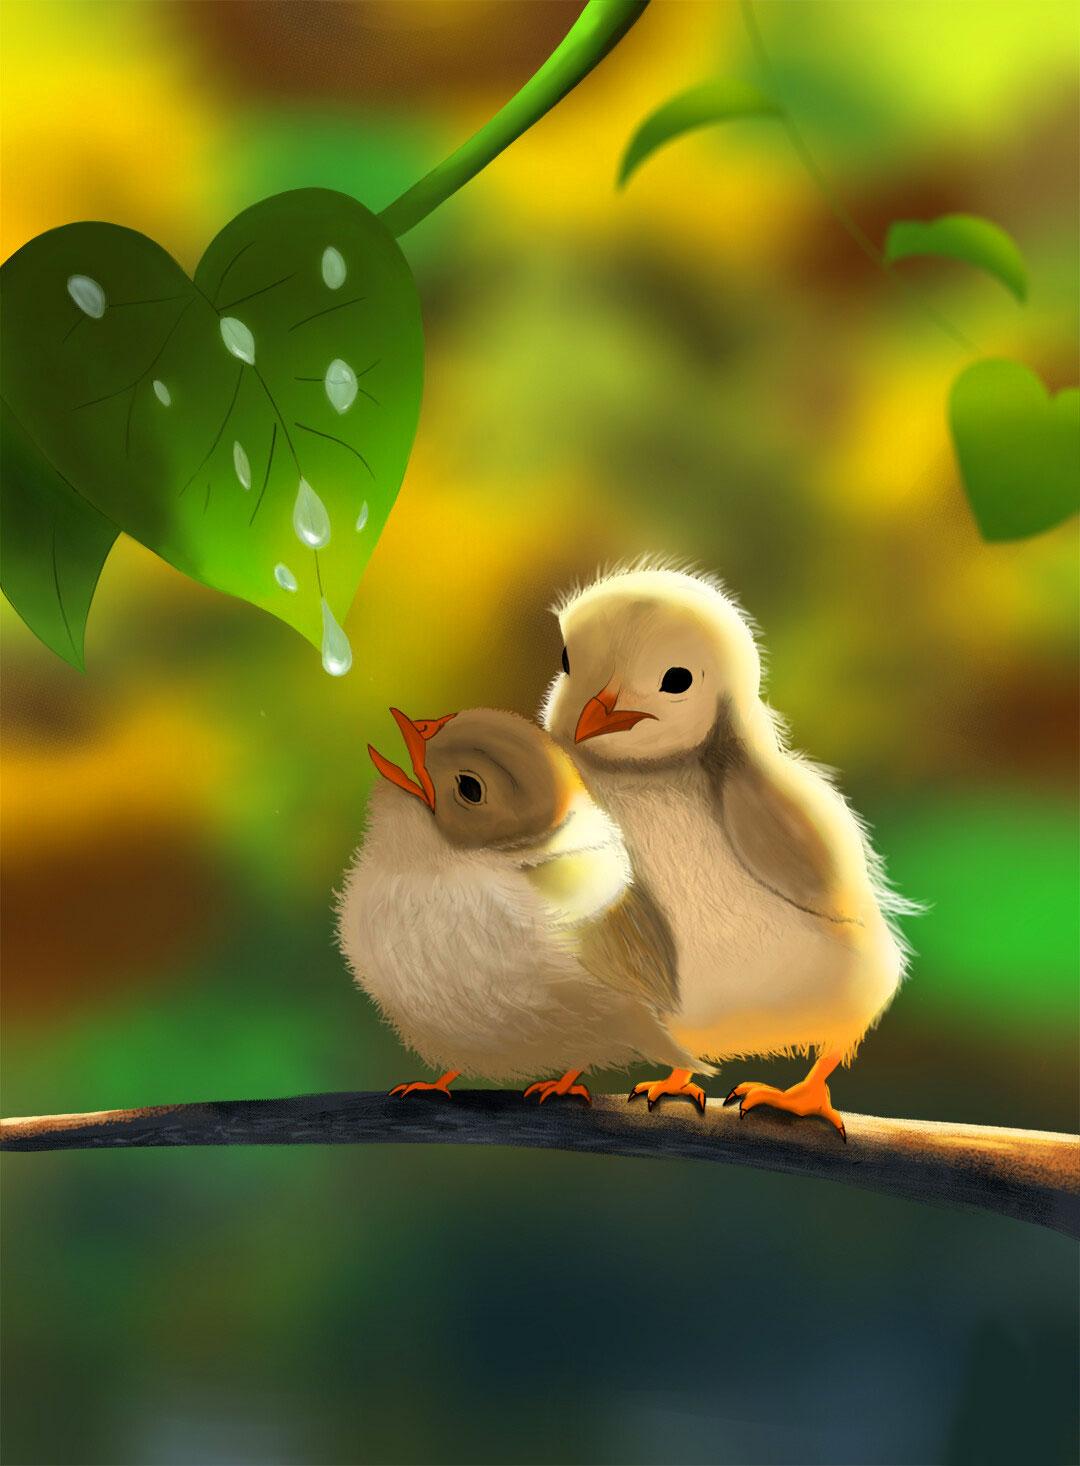 bird free Latest Superb Whatsapp Dp Images